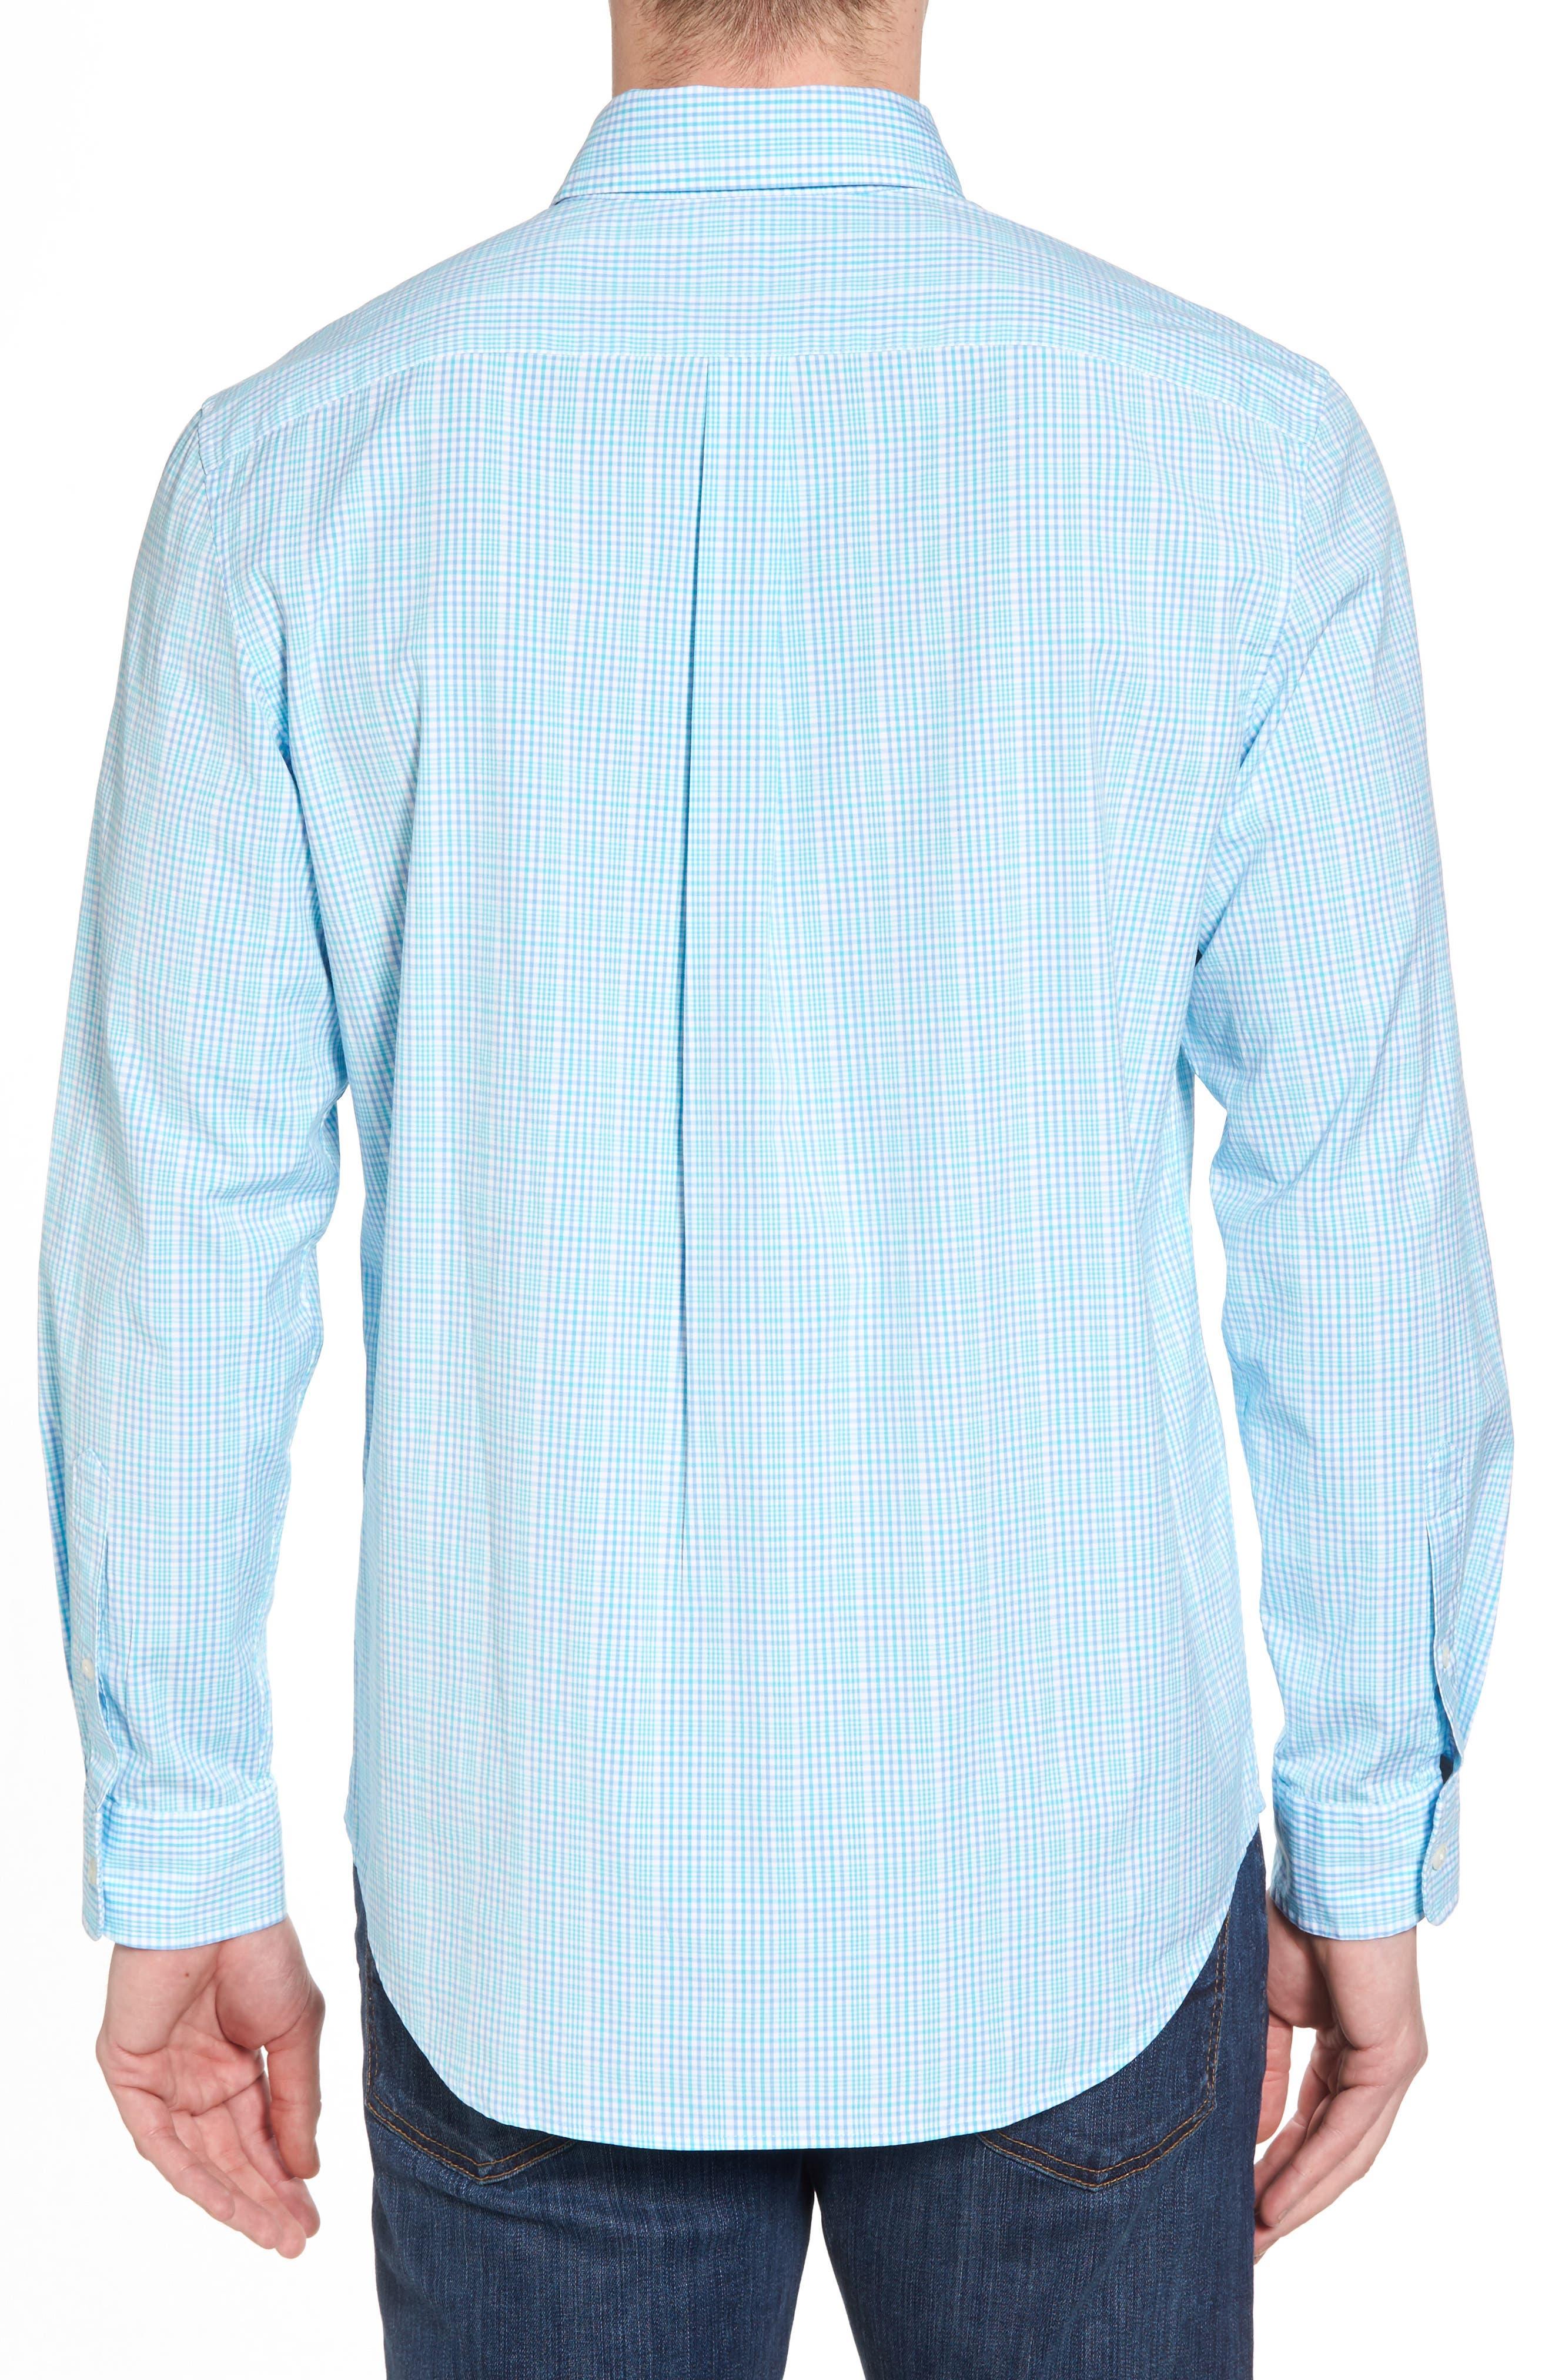 Rolling Harbor Classic Fit Plaid Sport Shirt,                             Alternate thumbnail 2, color,                             Turquoise